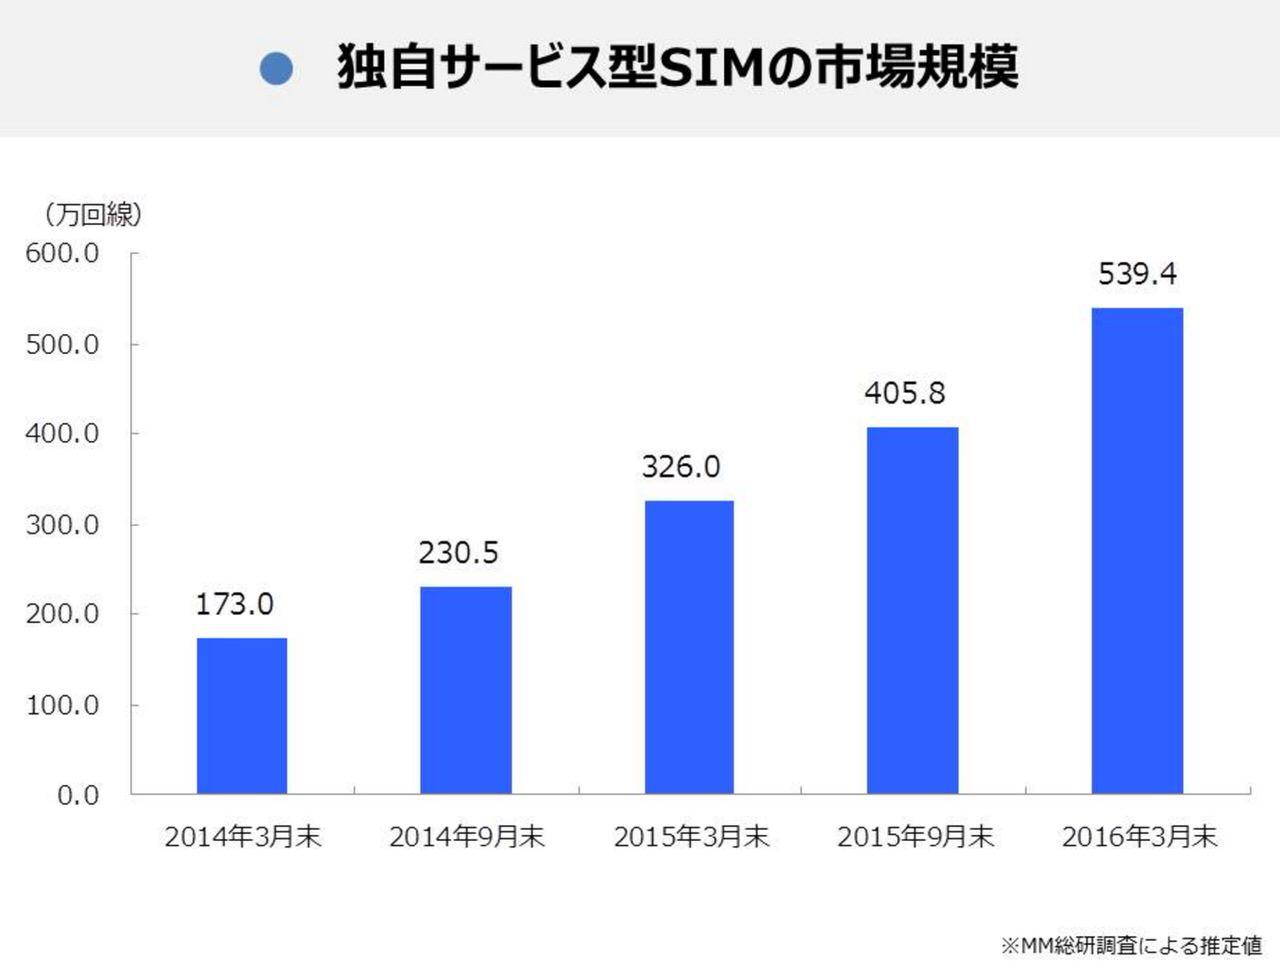 【MVNO】SIM契約数は539.4万回線に 〜個人シェアではIIJmioが1位